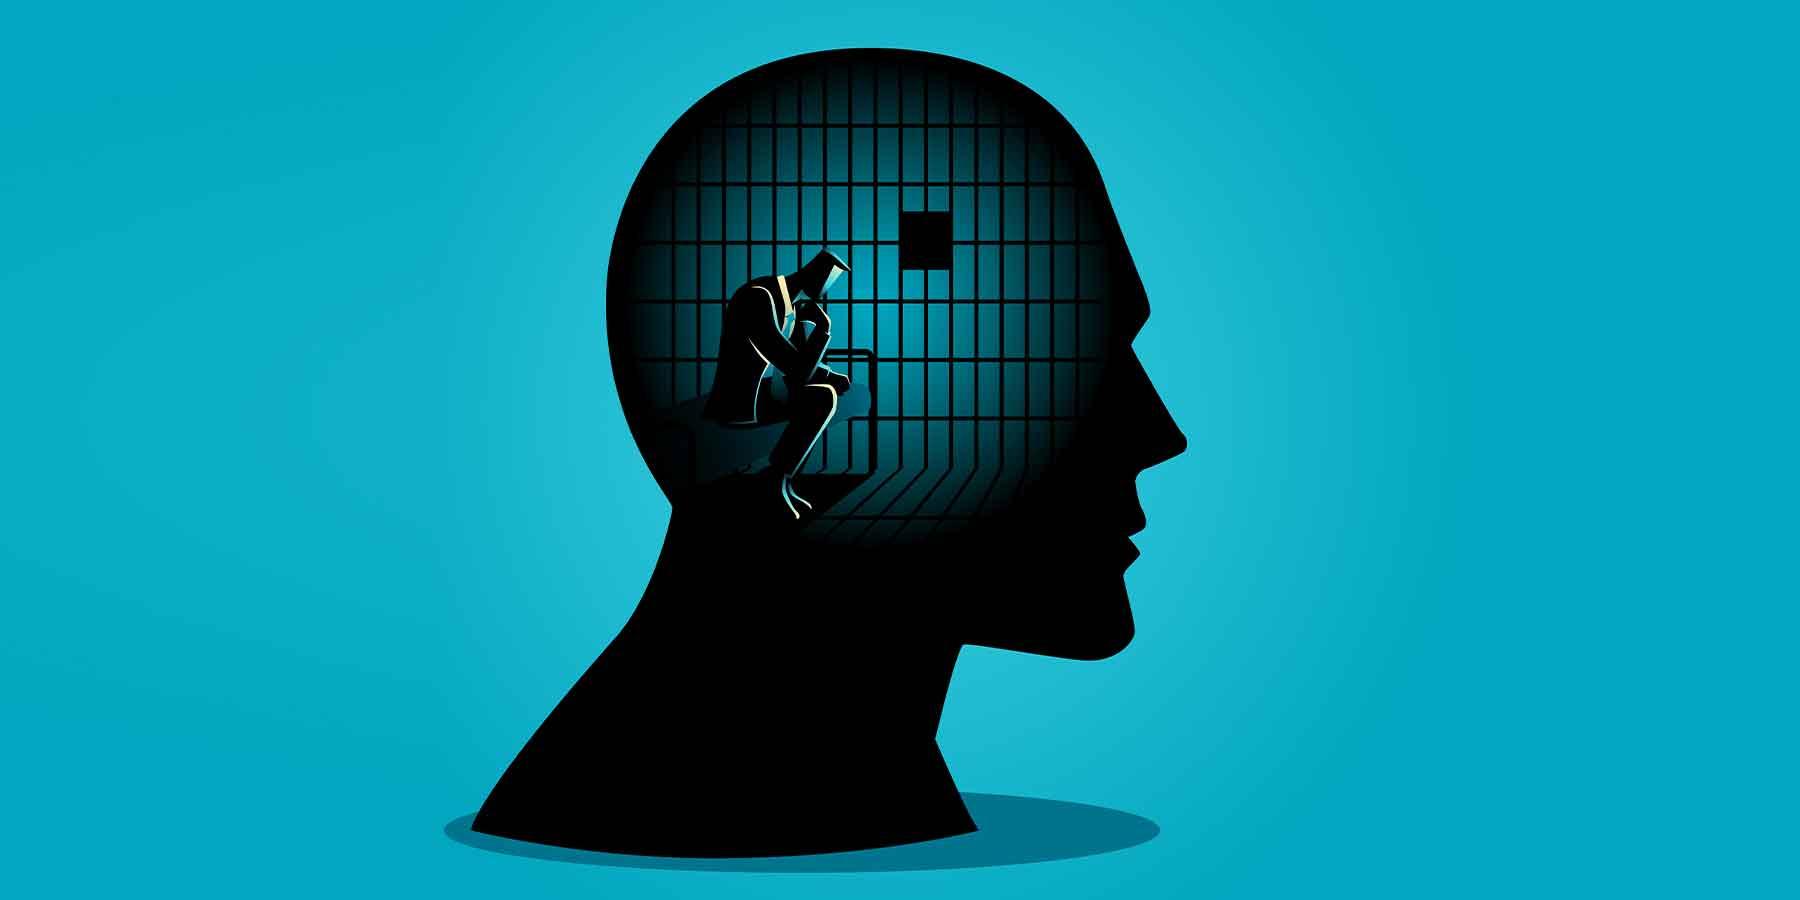 Narrow Mindedness - by Maulana Wahiduddin Khan